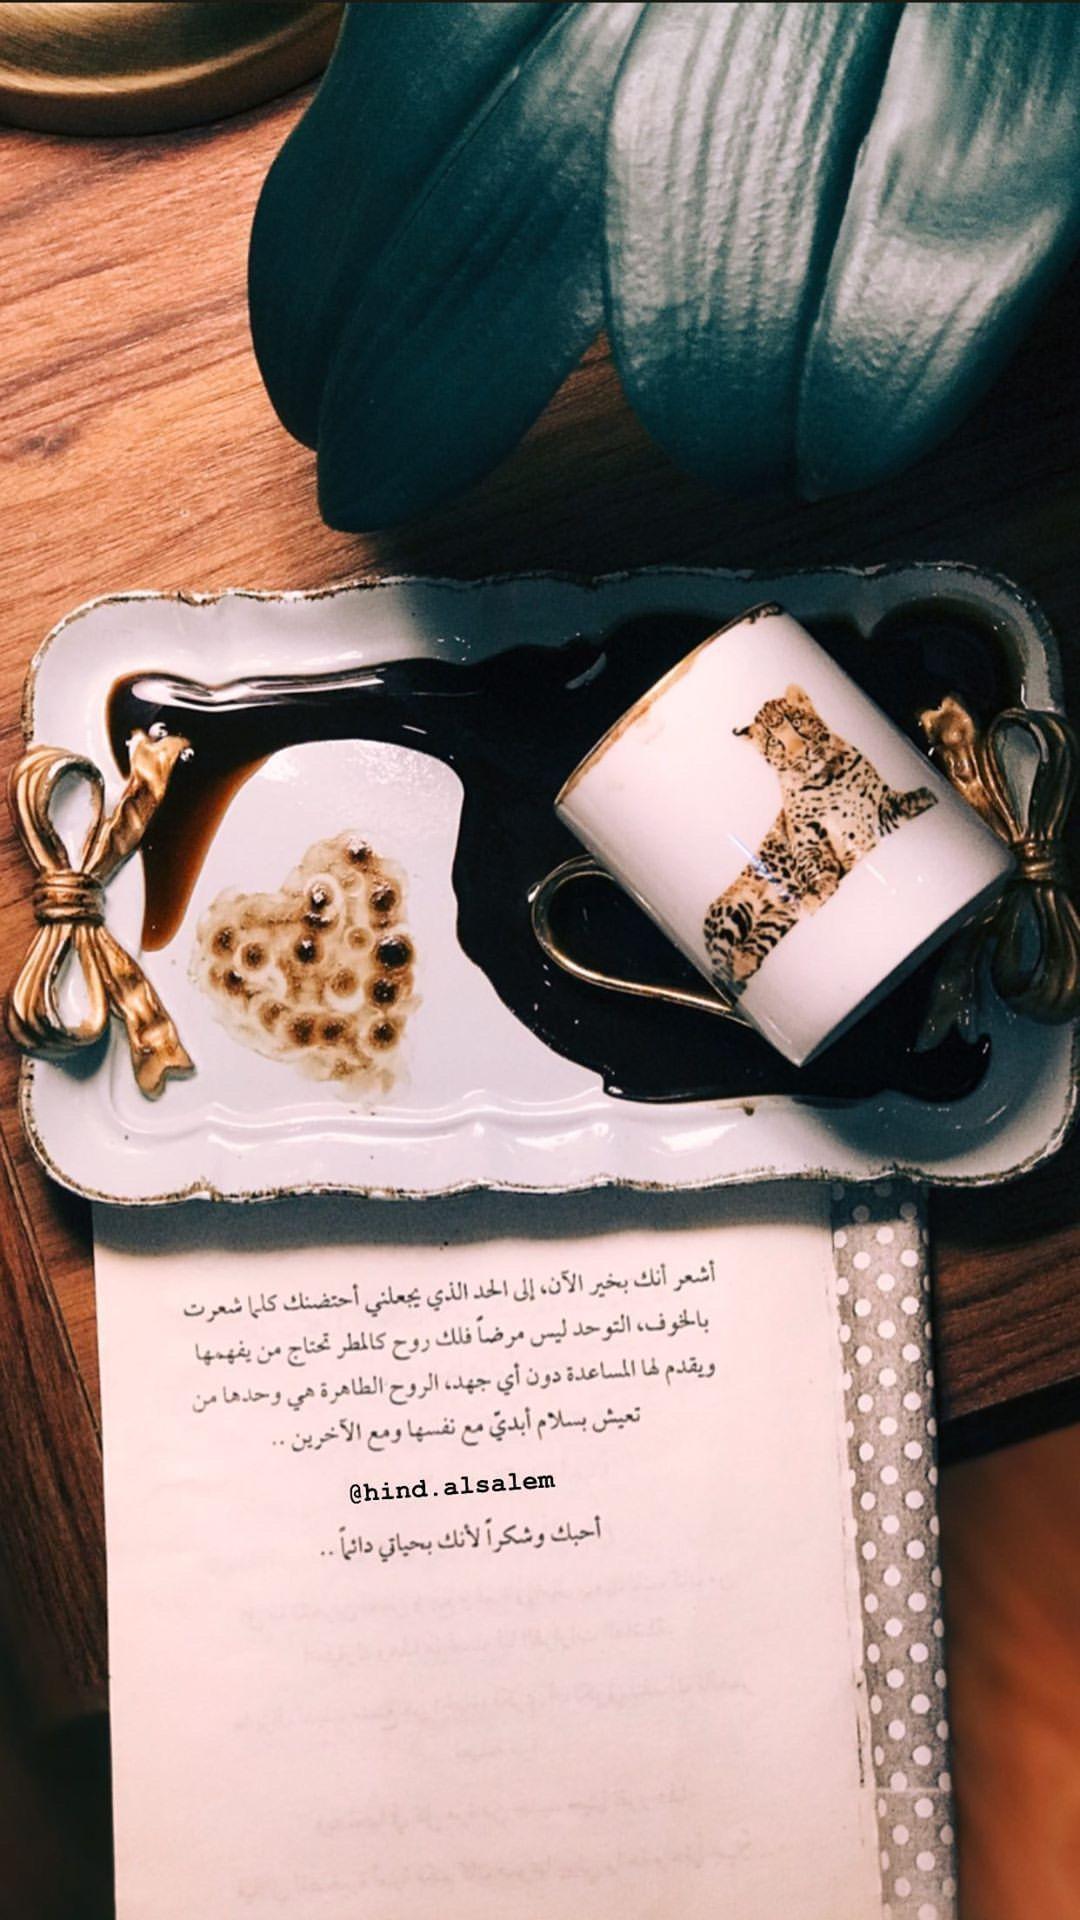 Photo Coffee Coffe Love Photography Lover Instagram Snap تصويري تصوير احترافي سناب صوره ابداع حب عشق ورد مساء الحب مساء Coffee Quotes Coffee